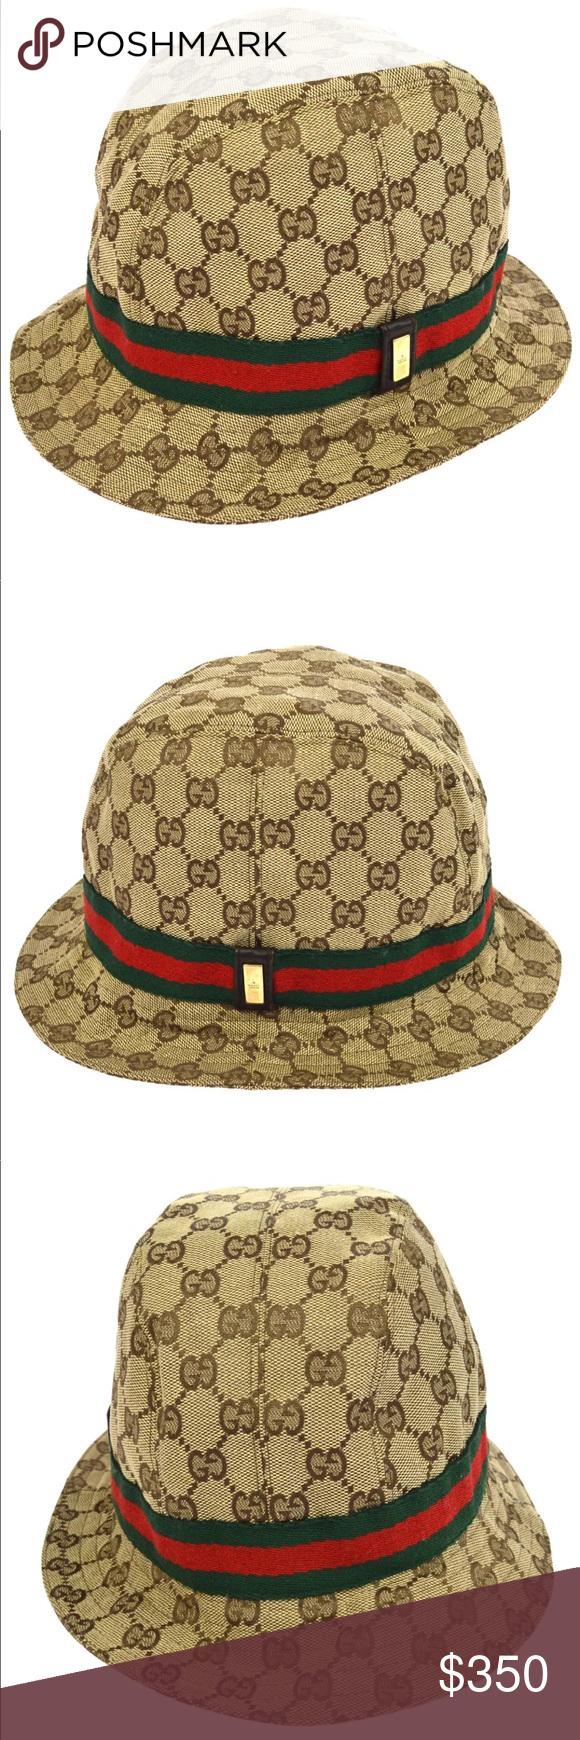 Gucci Logo Pattern Ladies Hat Medium Size Hats For Women Gucci Logo Pattern